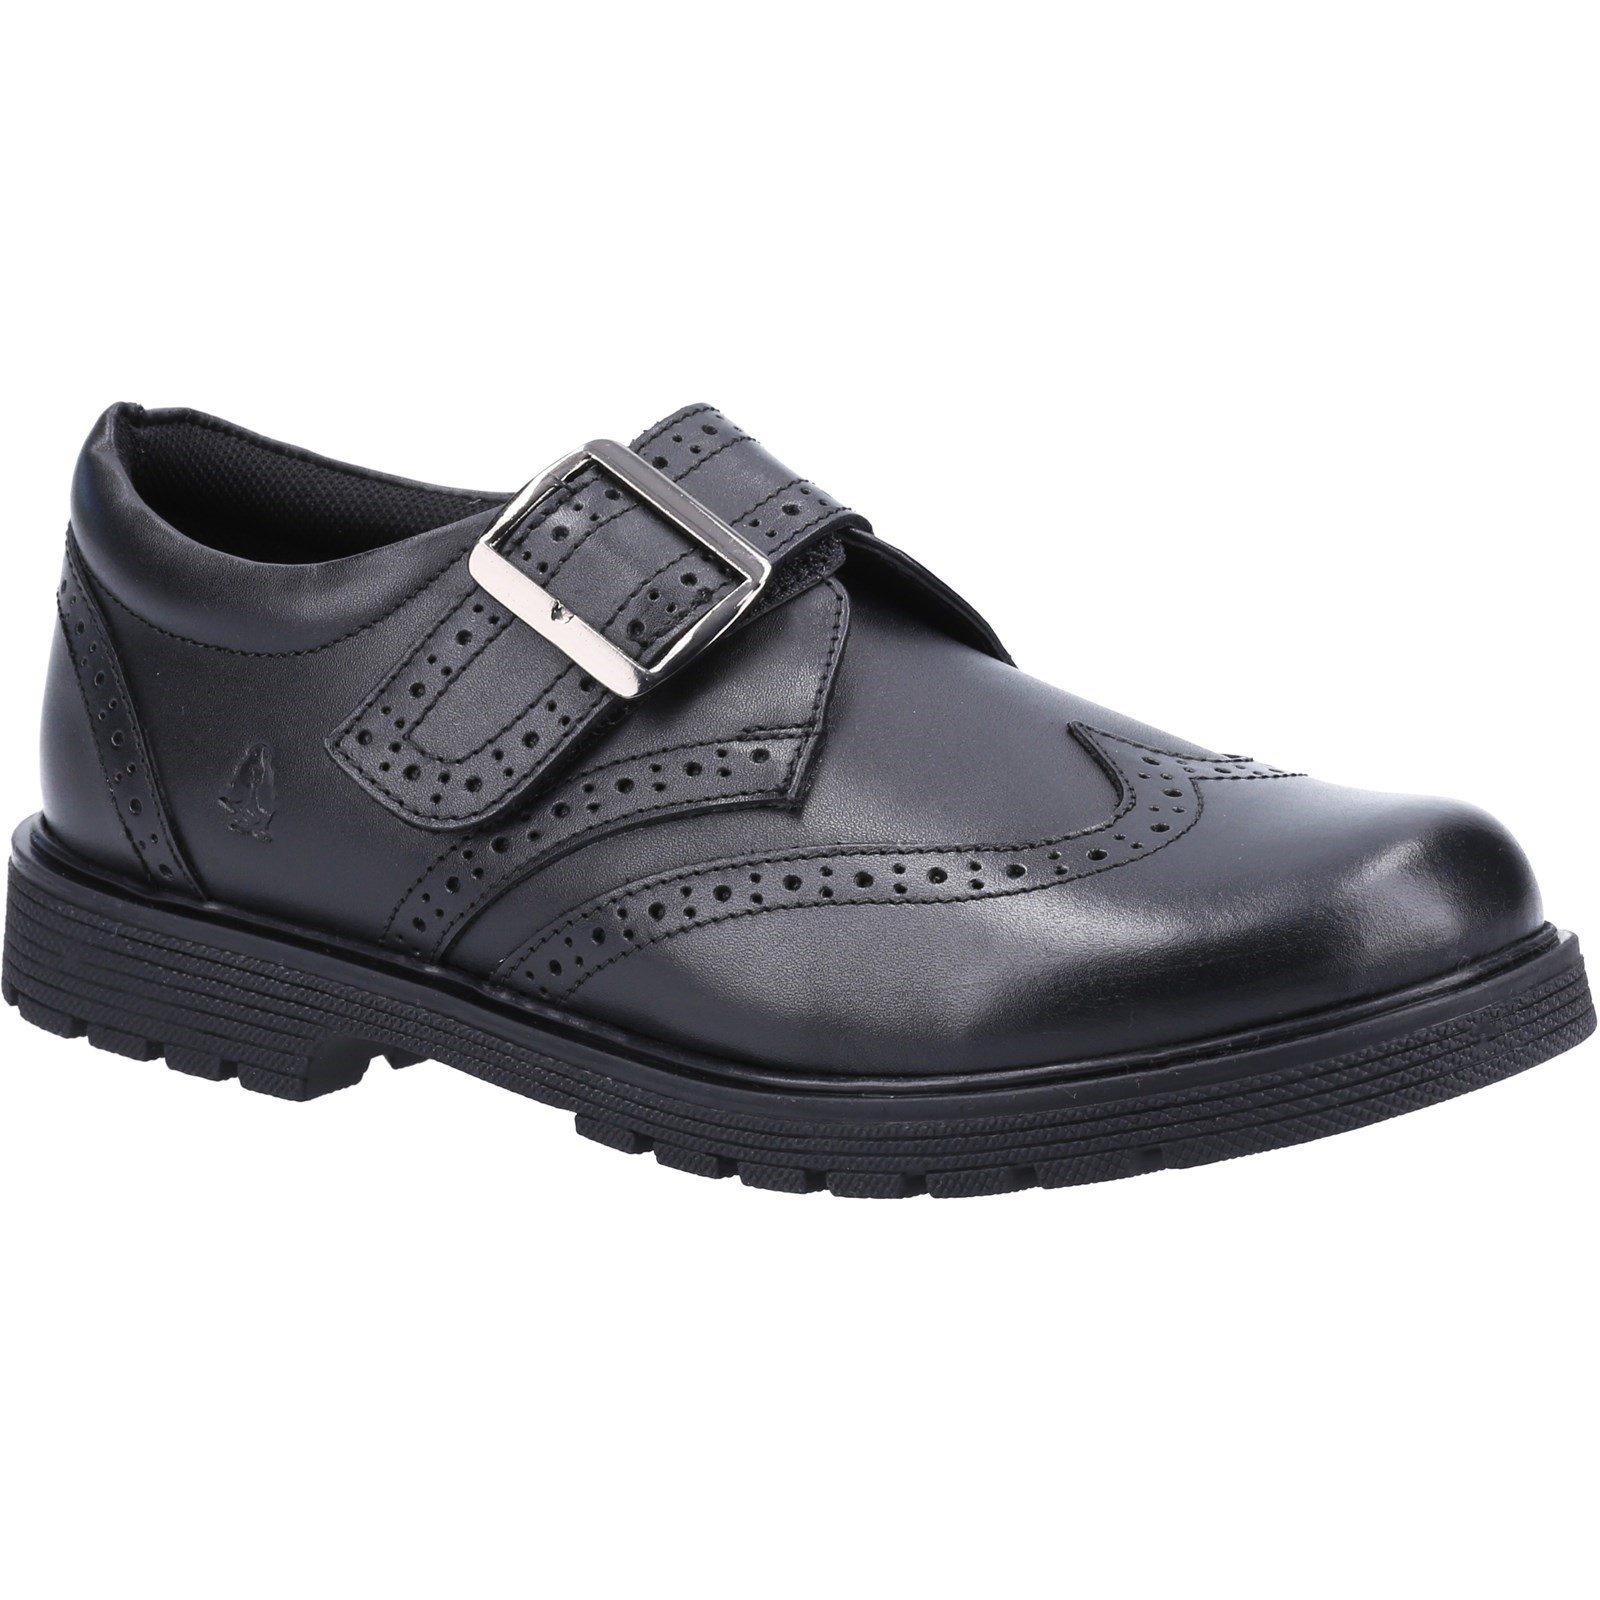 Hush Puppies Kid's Rhiannon Junior School Shoe Black 32625 - Black 12